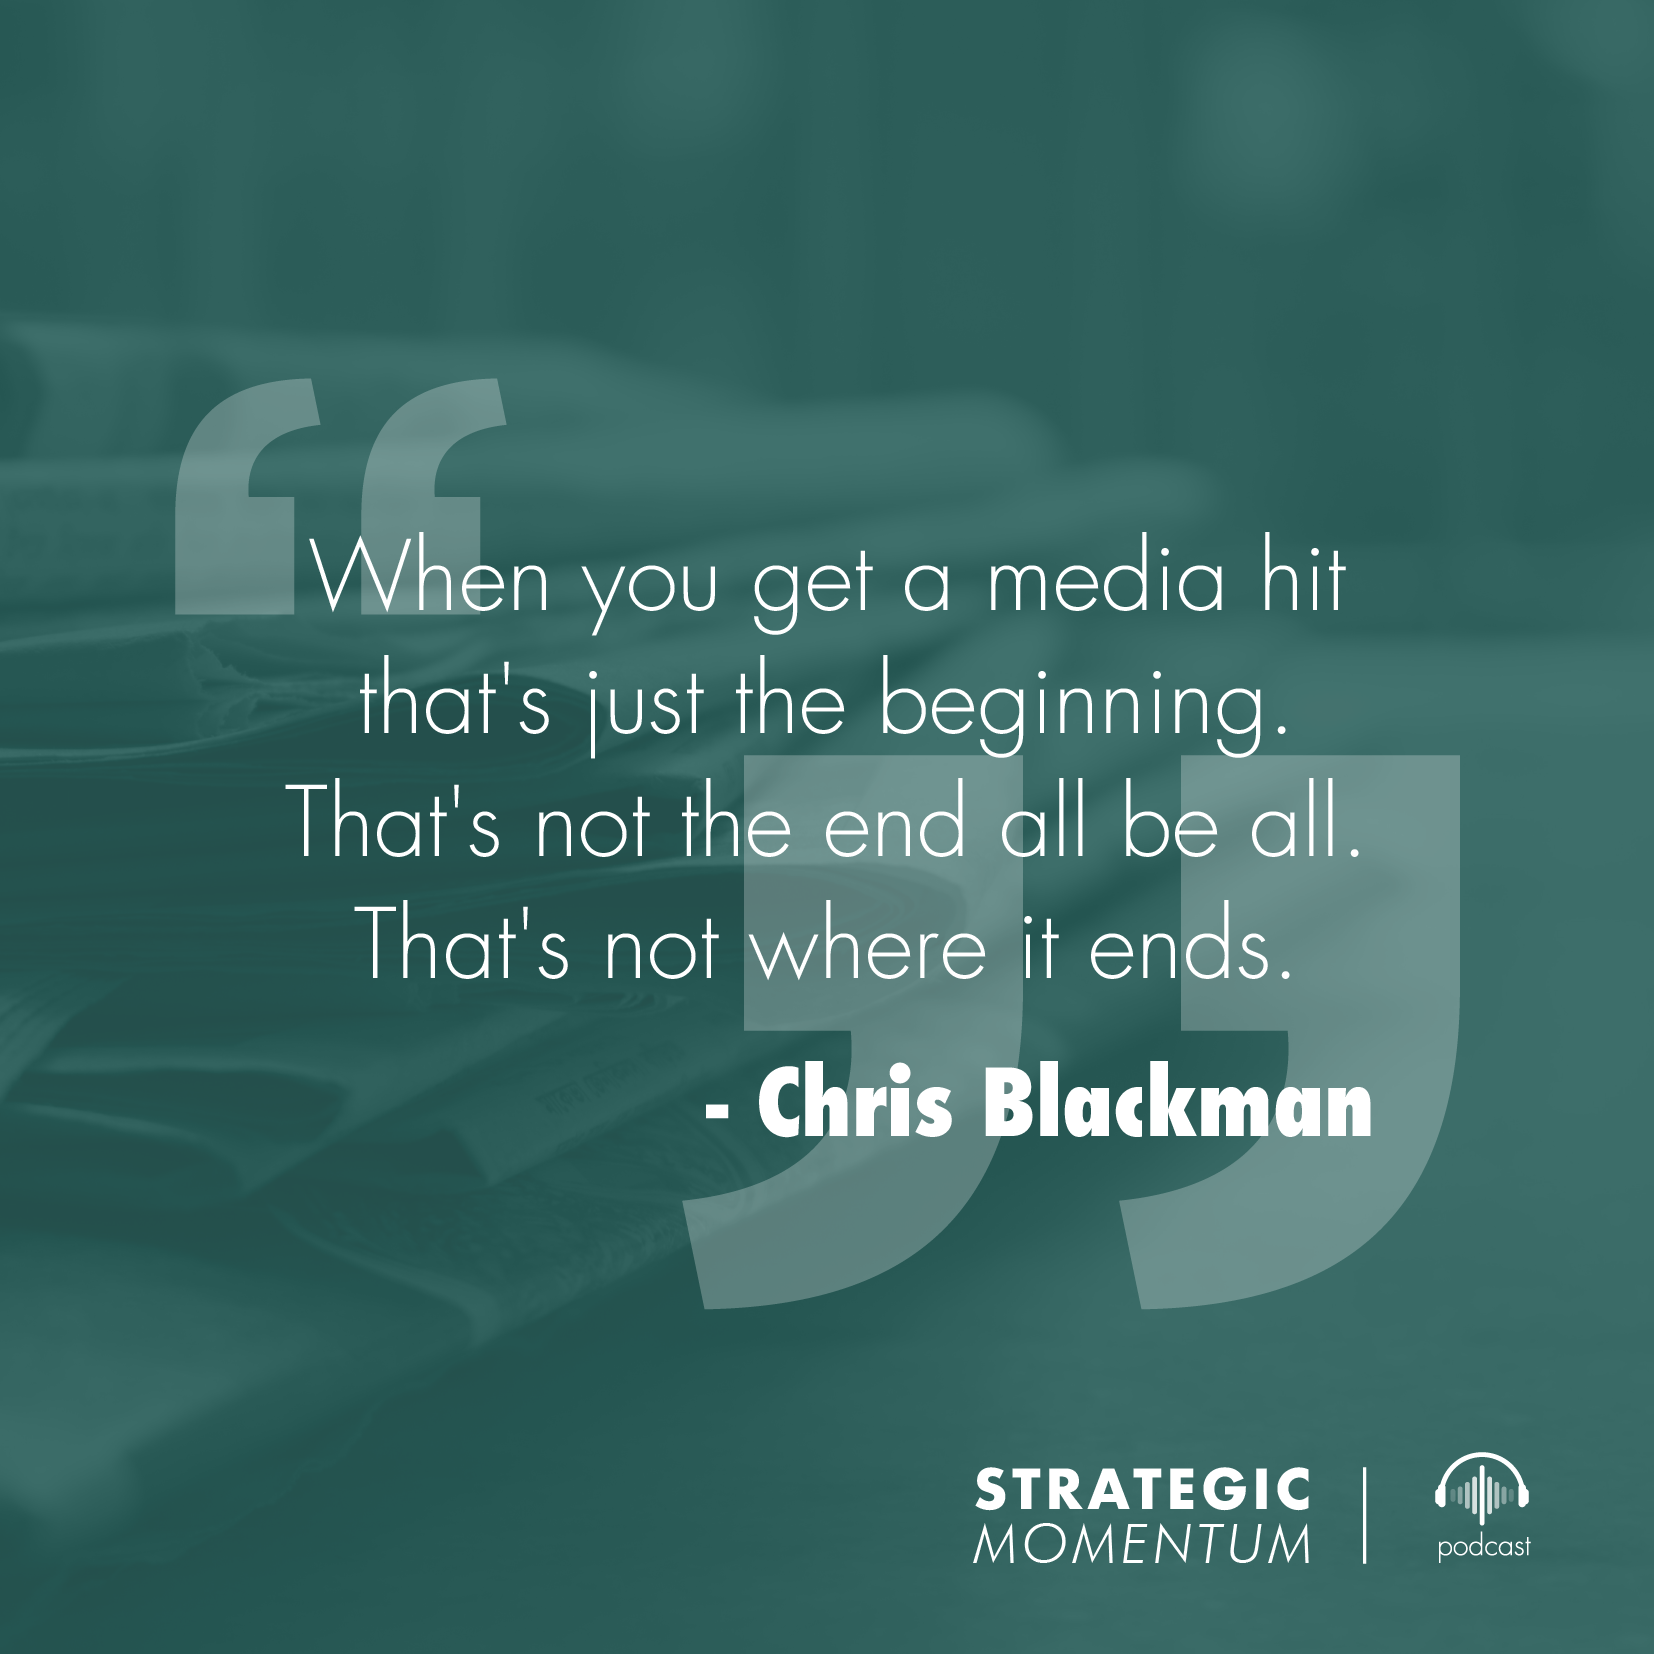 Chris Blackman Quote | Strategic Momentum Podcast